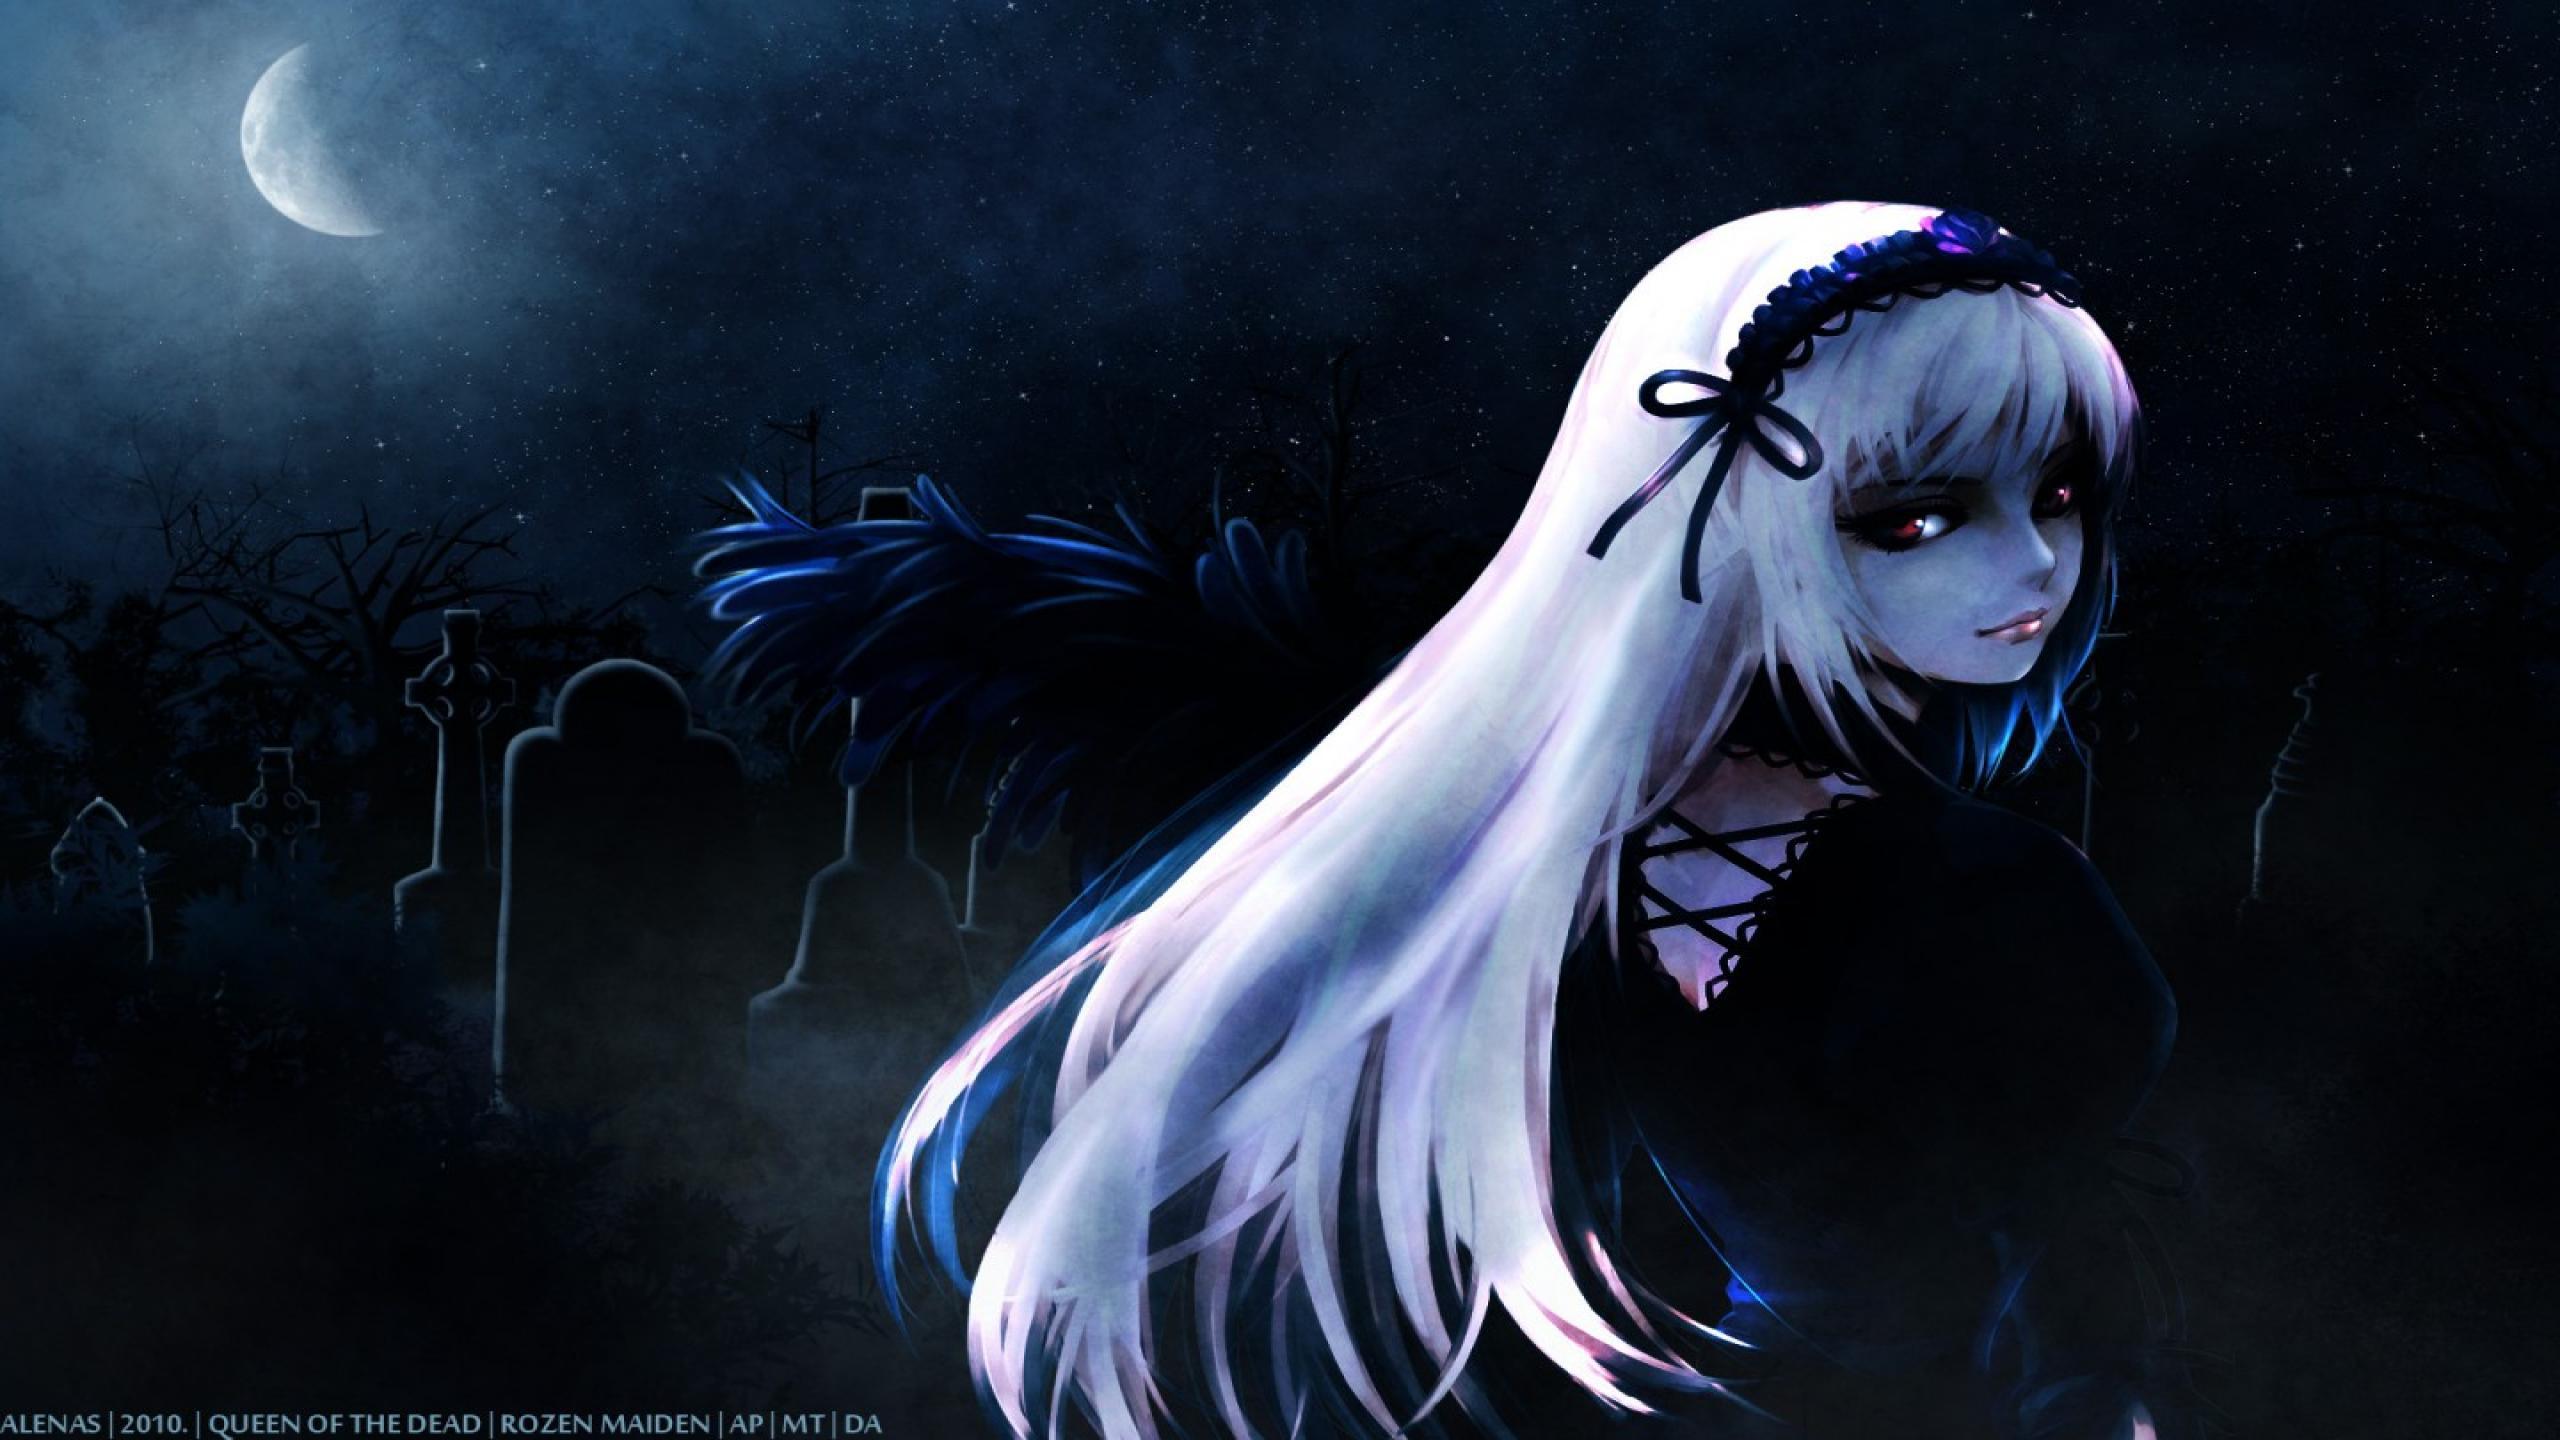 Anime hd wallpaper 2560x1440 wallpapersafari - Best anime desktop backgrounds ...